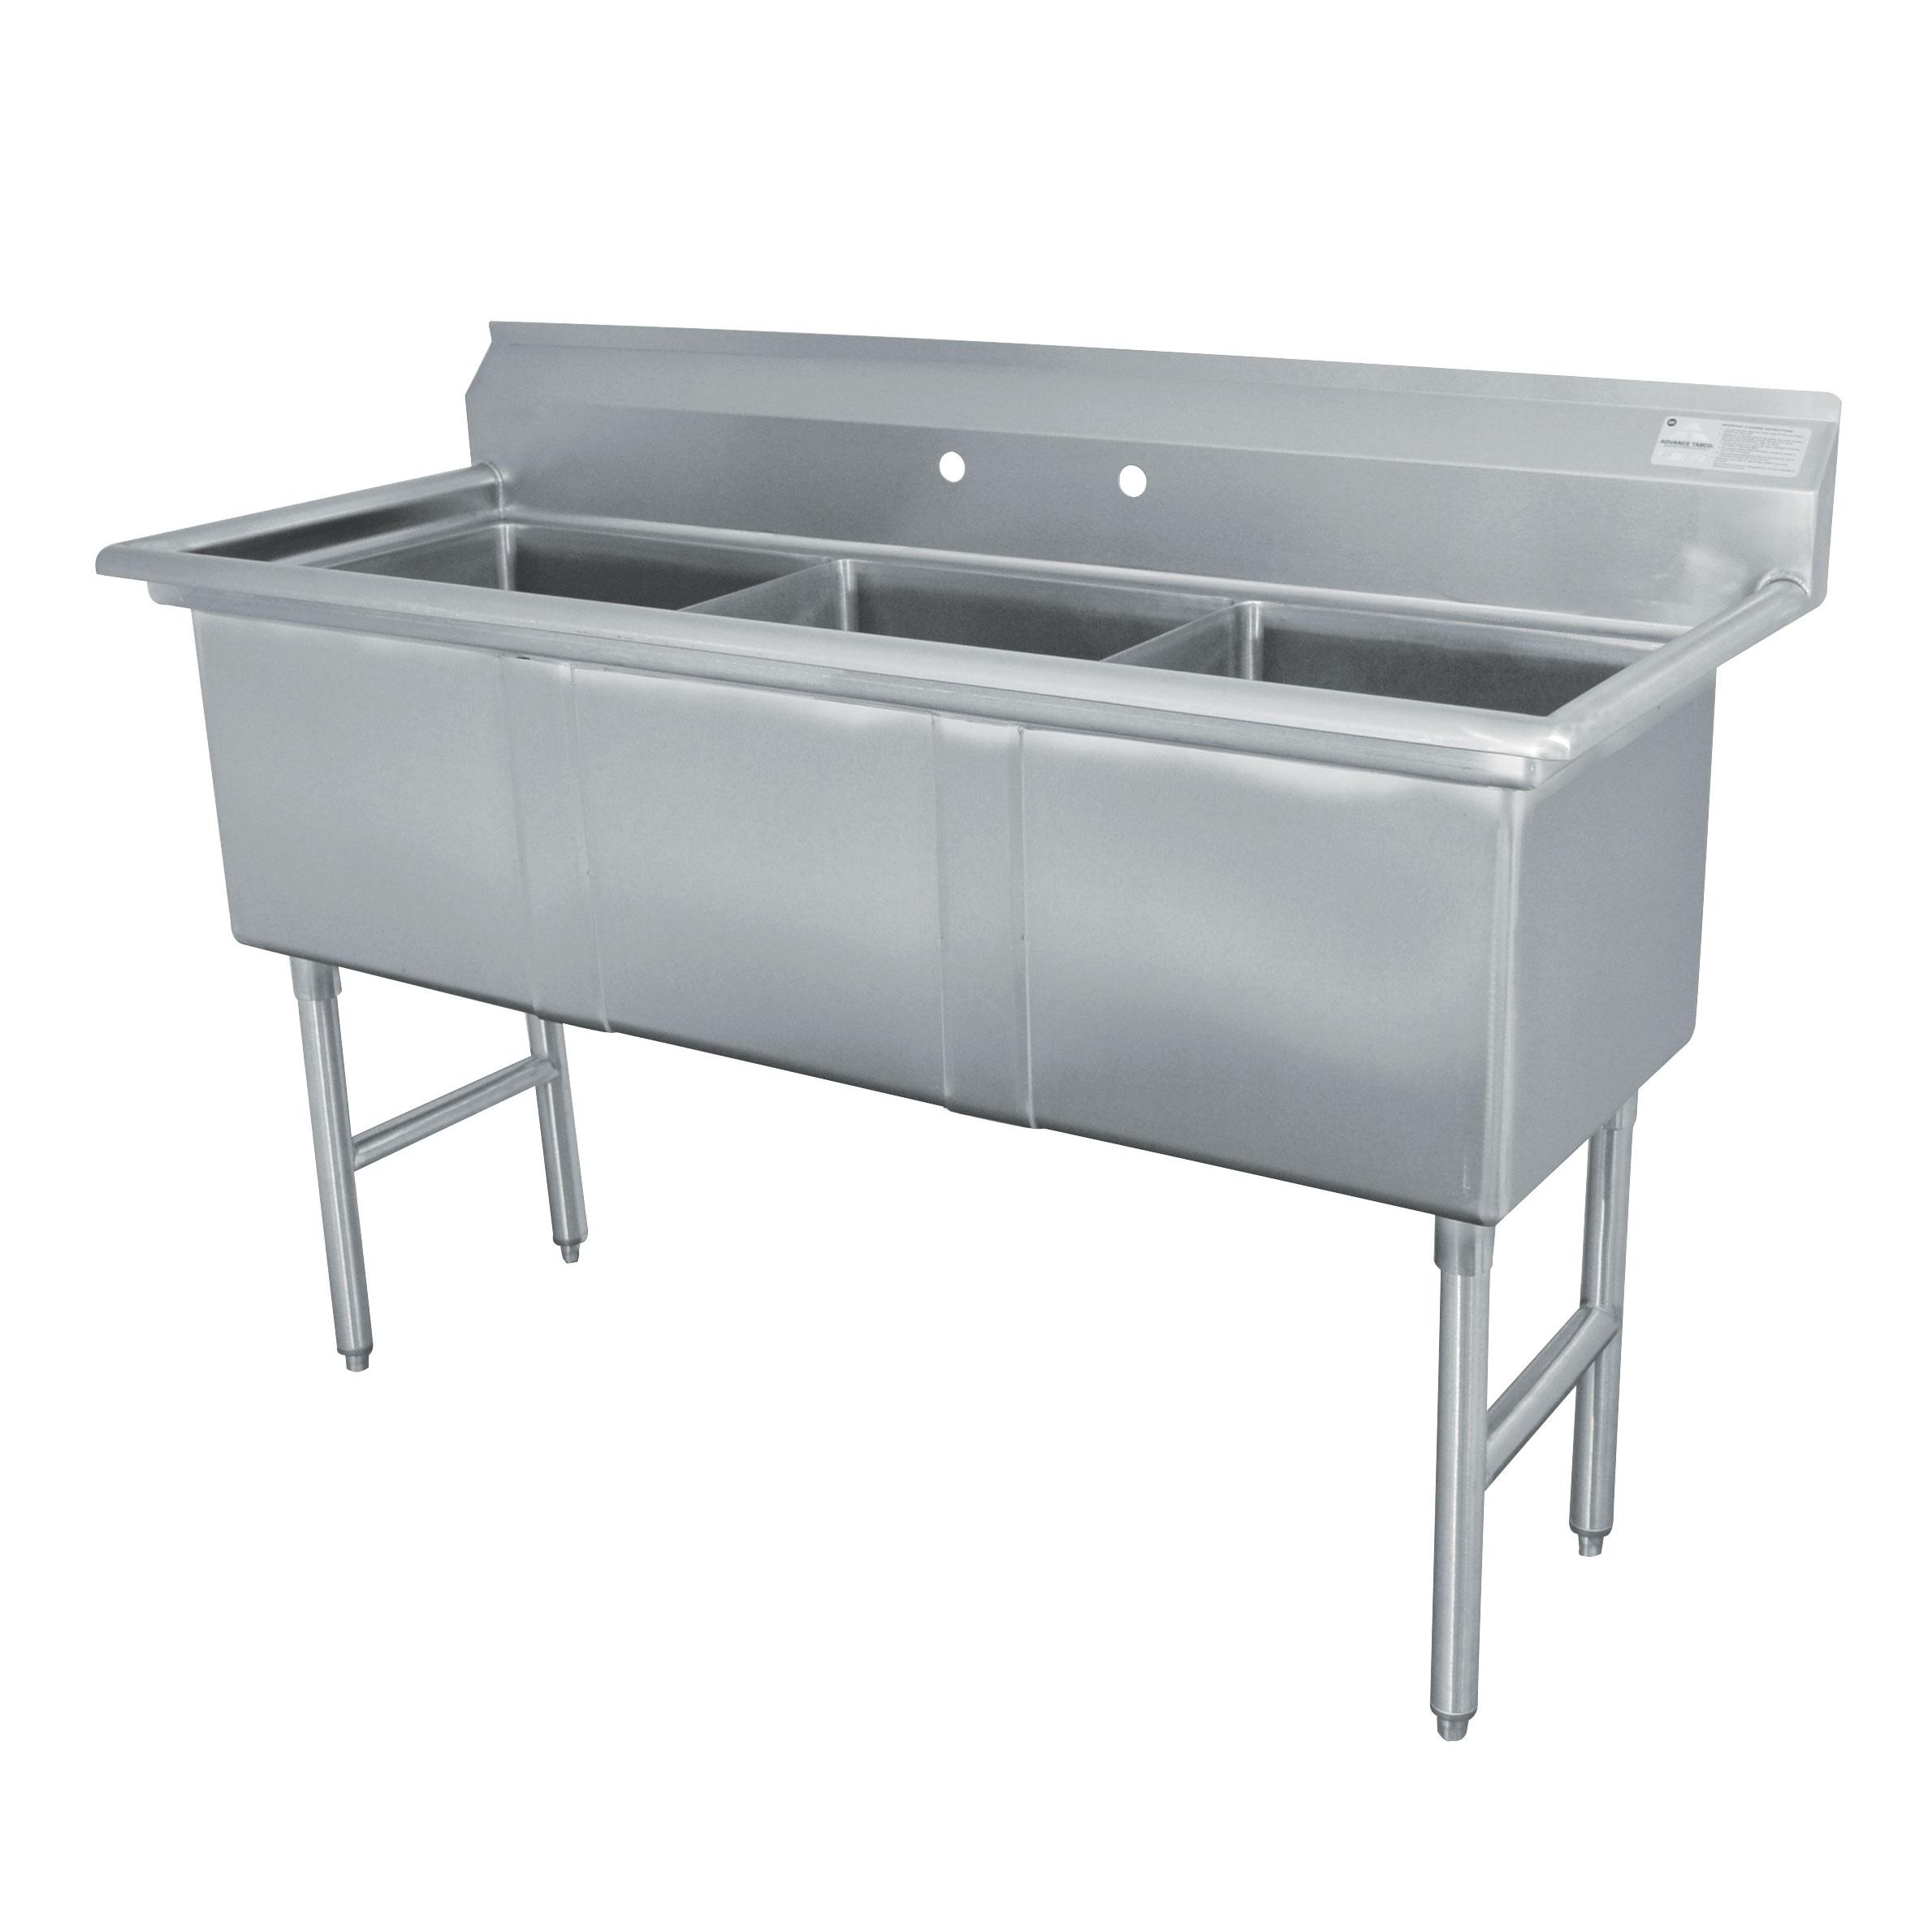 Advance Tabco FC-3-2430 sink, (3) three compartment